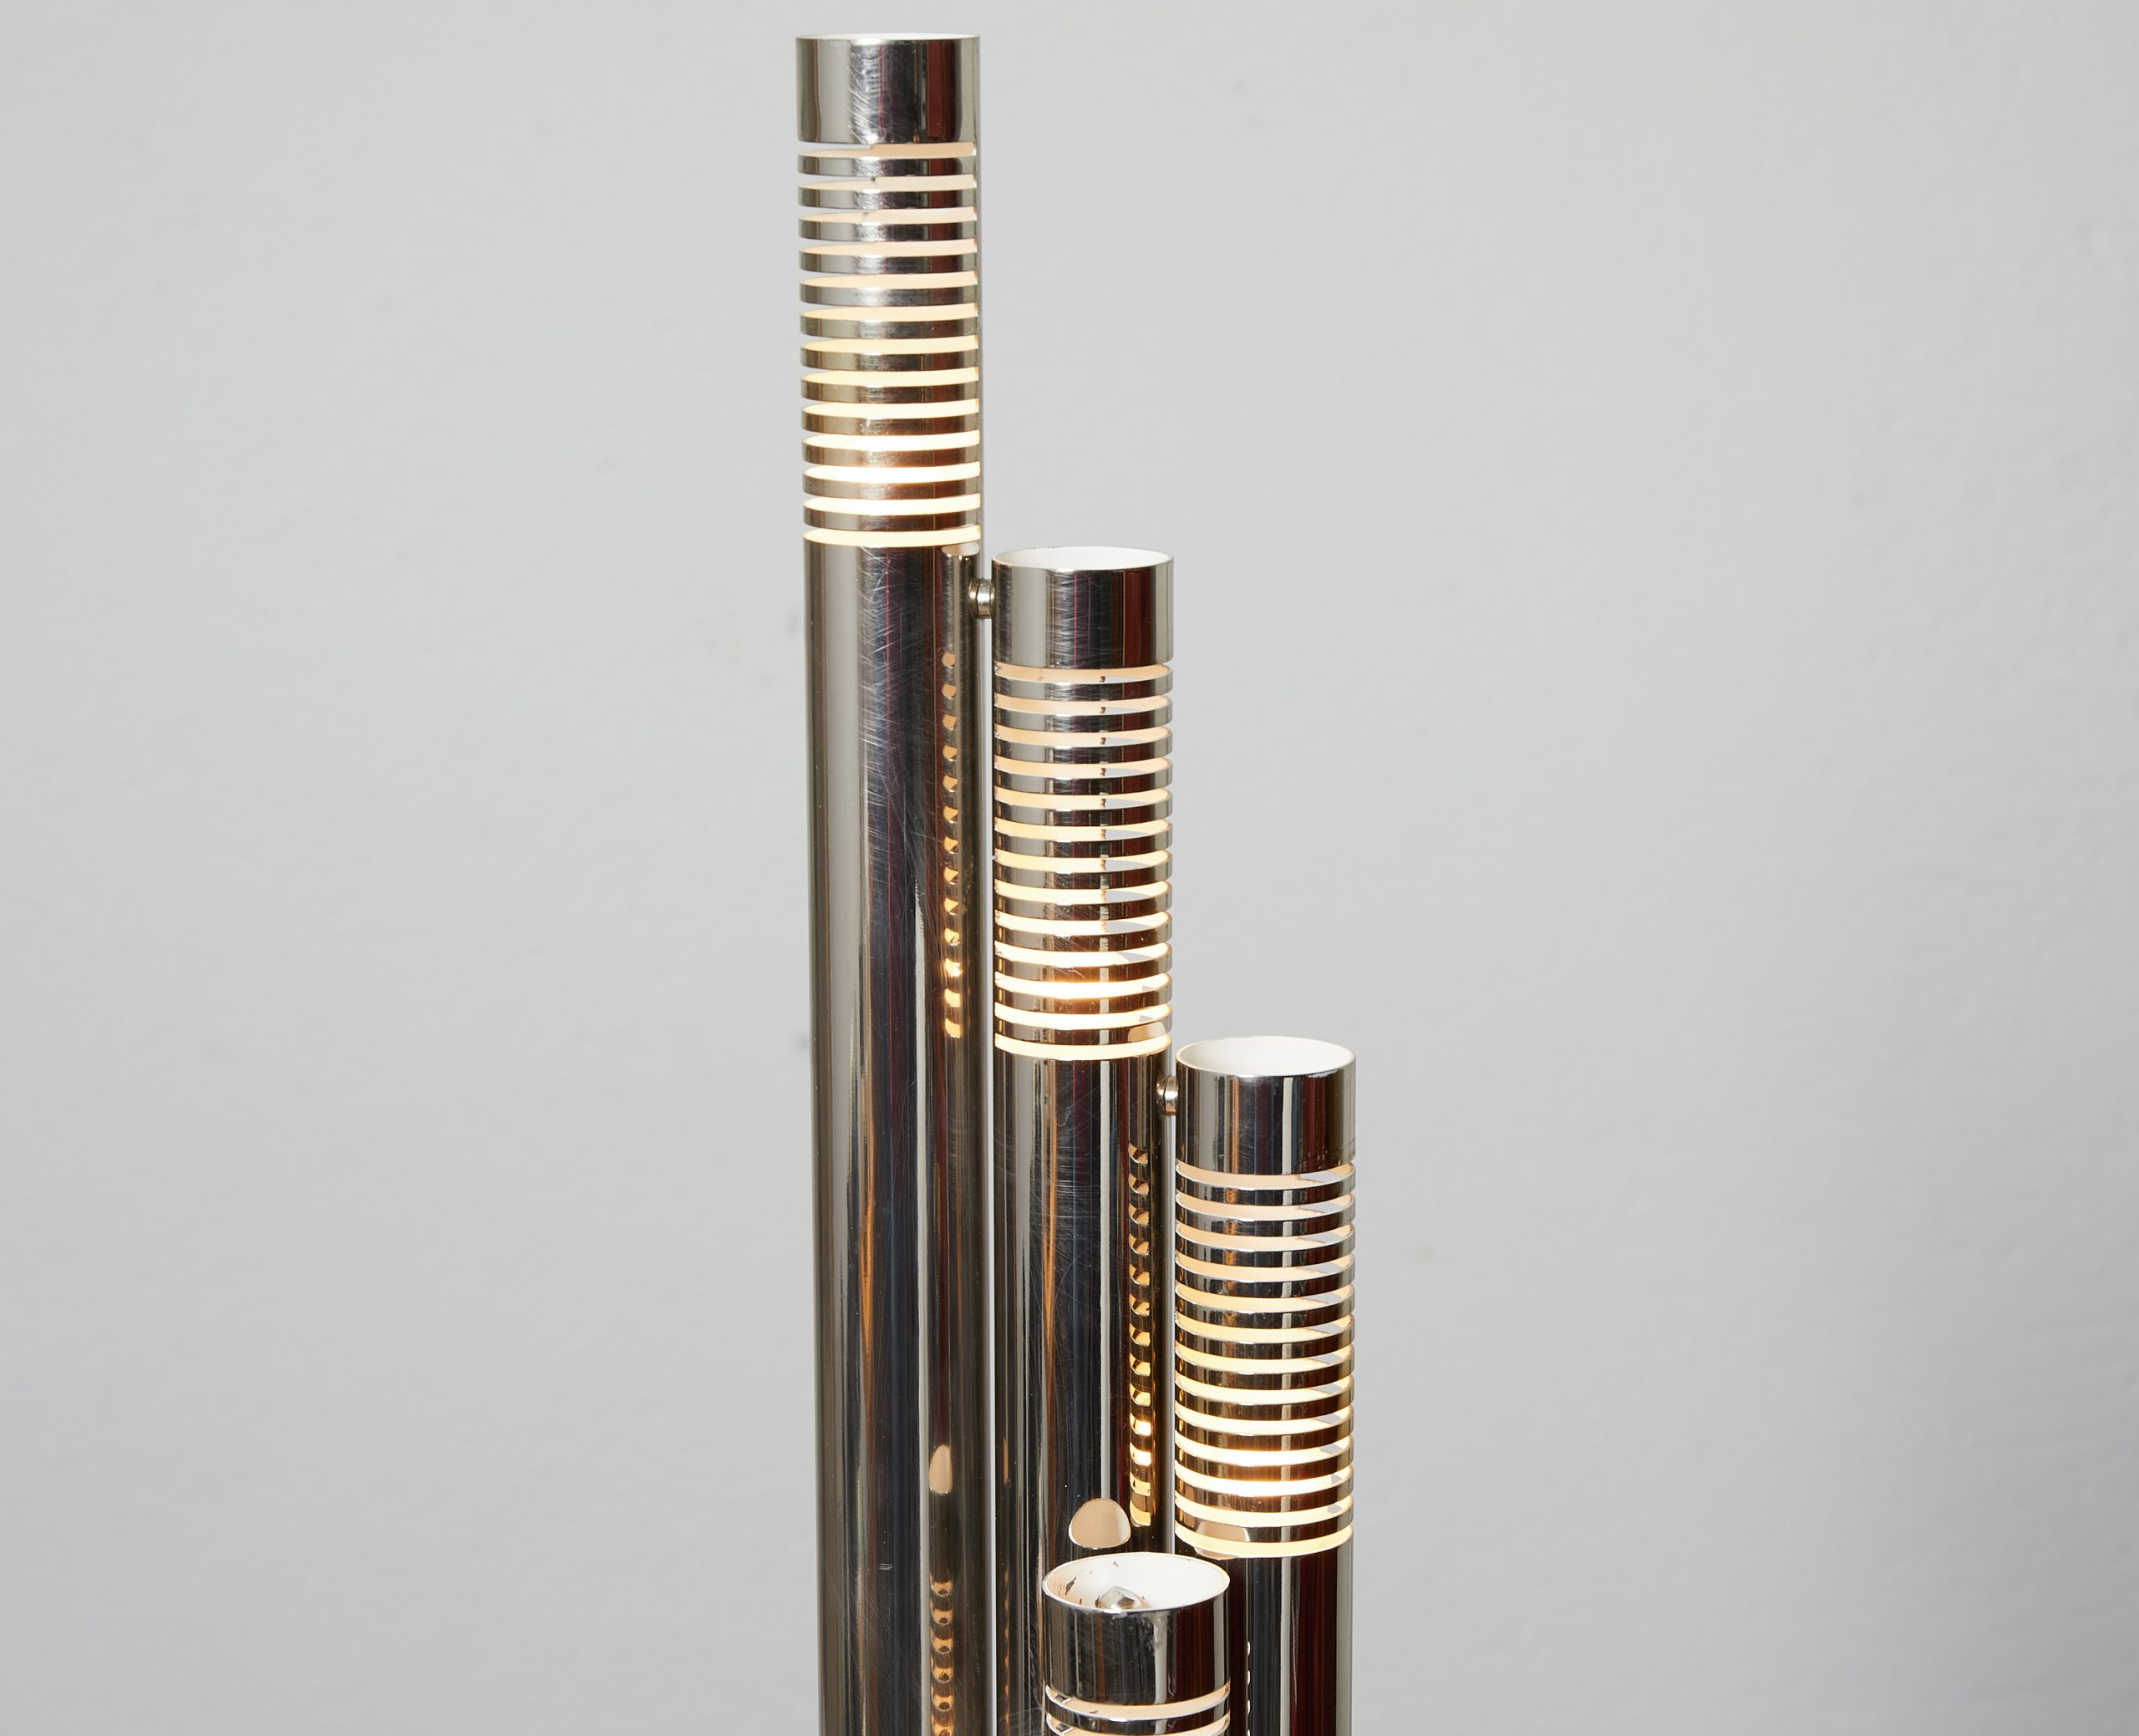 italian-chromed-metal-tubular-table-lamp-c-1970-image-03